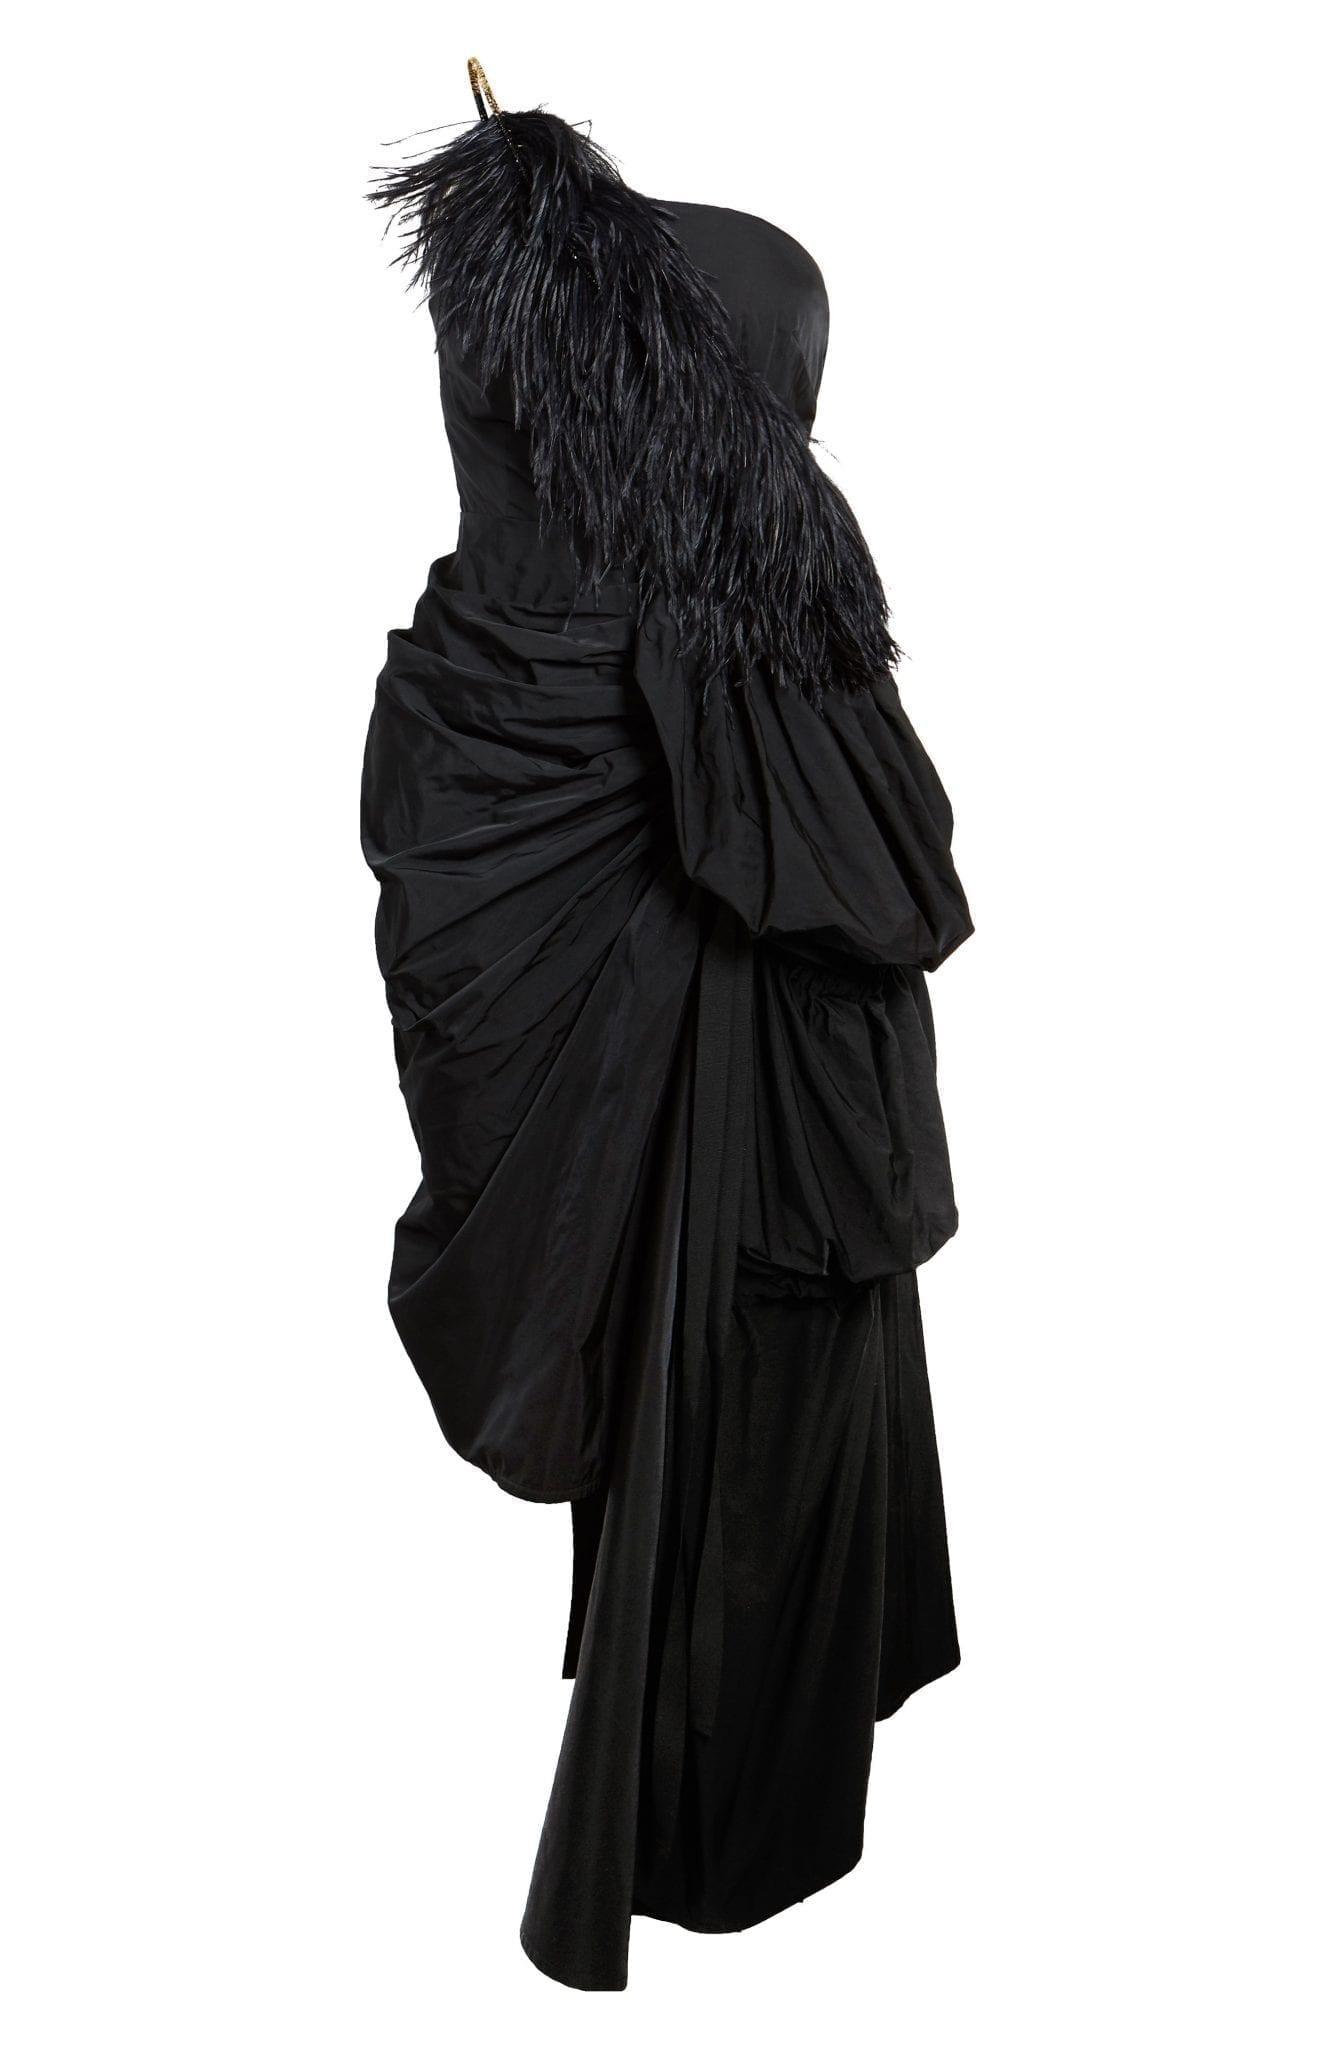 DRIES VAN NOTEN Dires Van Noten Ditomi Feather Trim Asymmetrical One-Shoulder Taffeta Dress